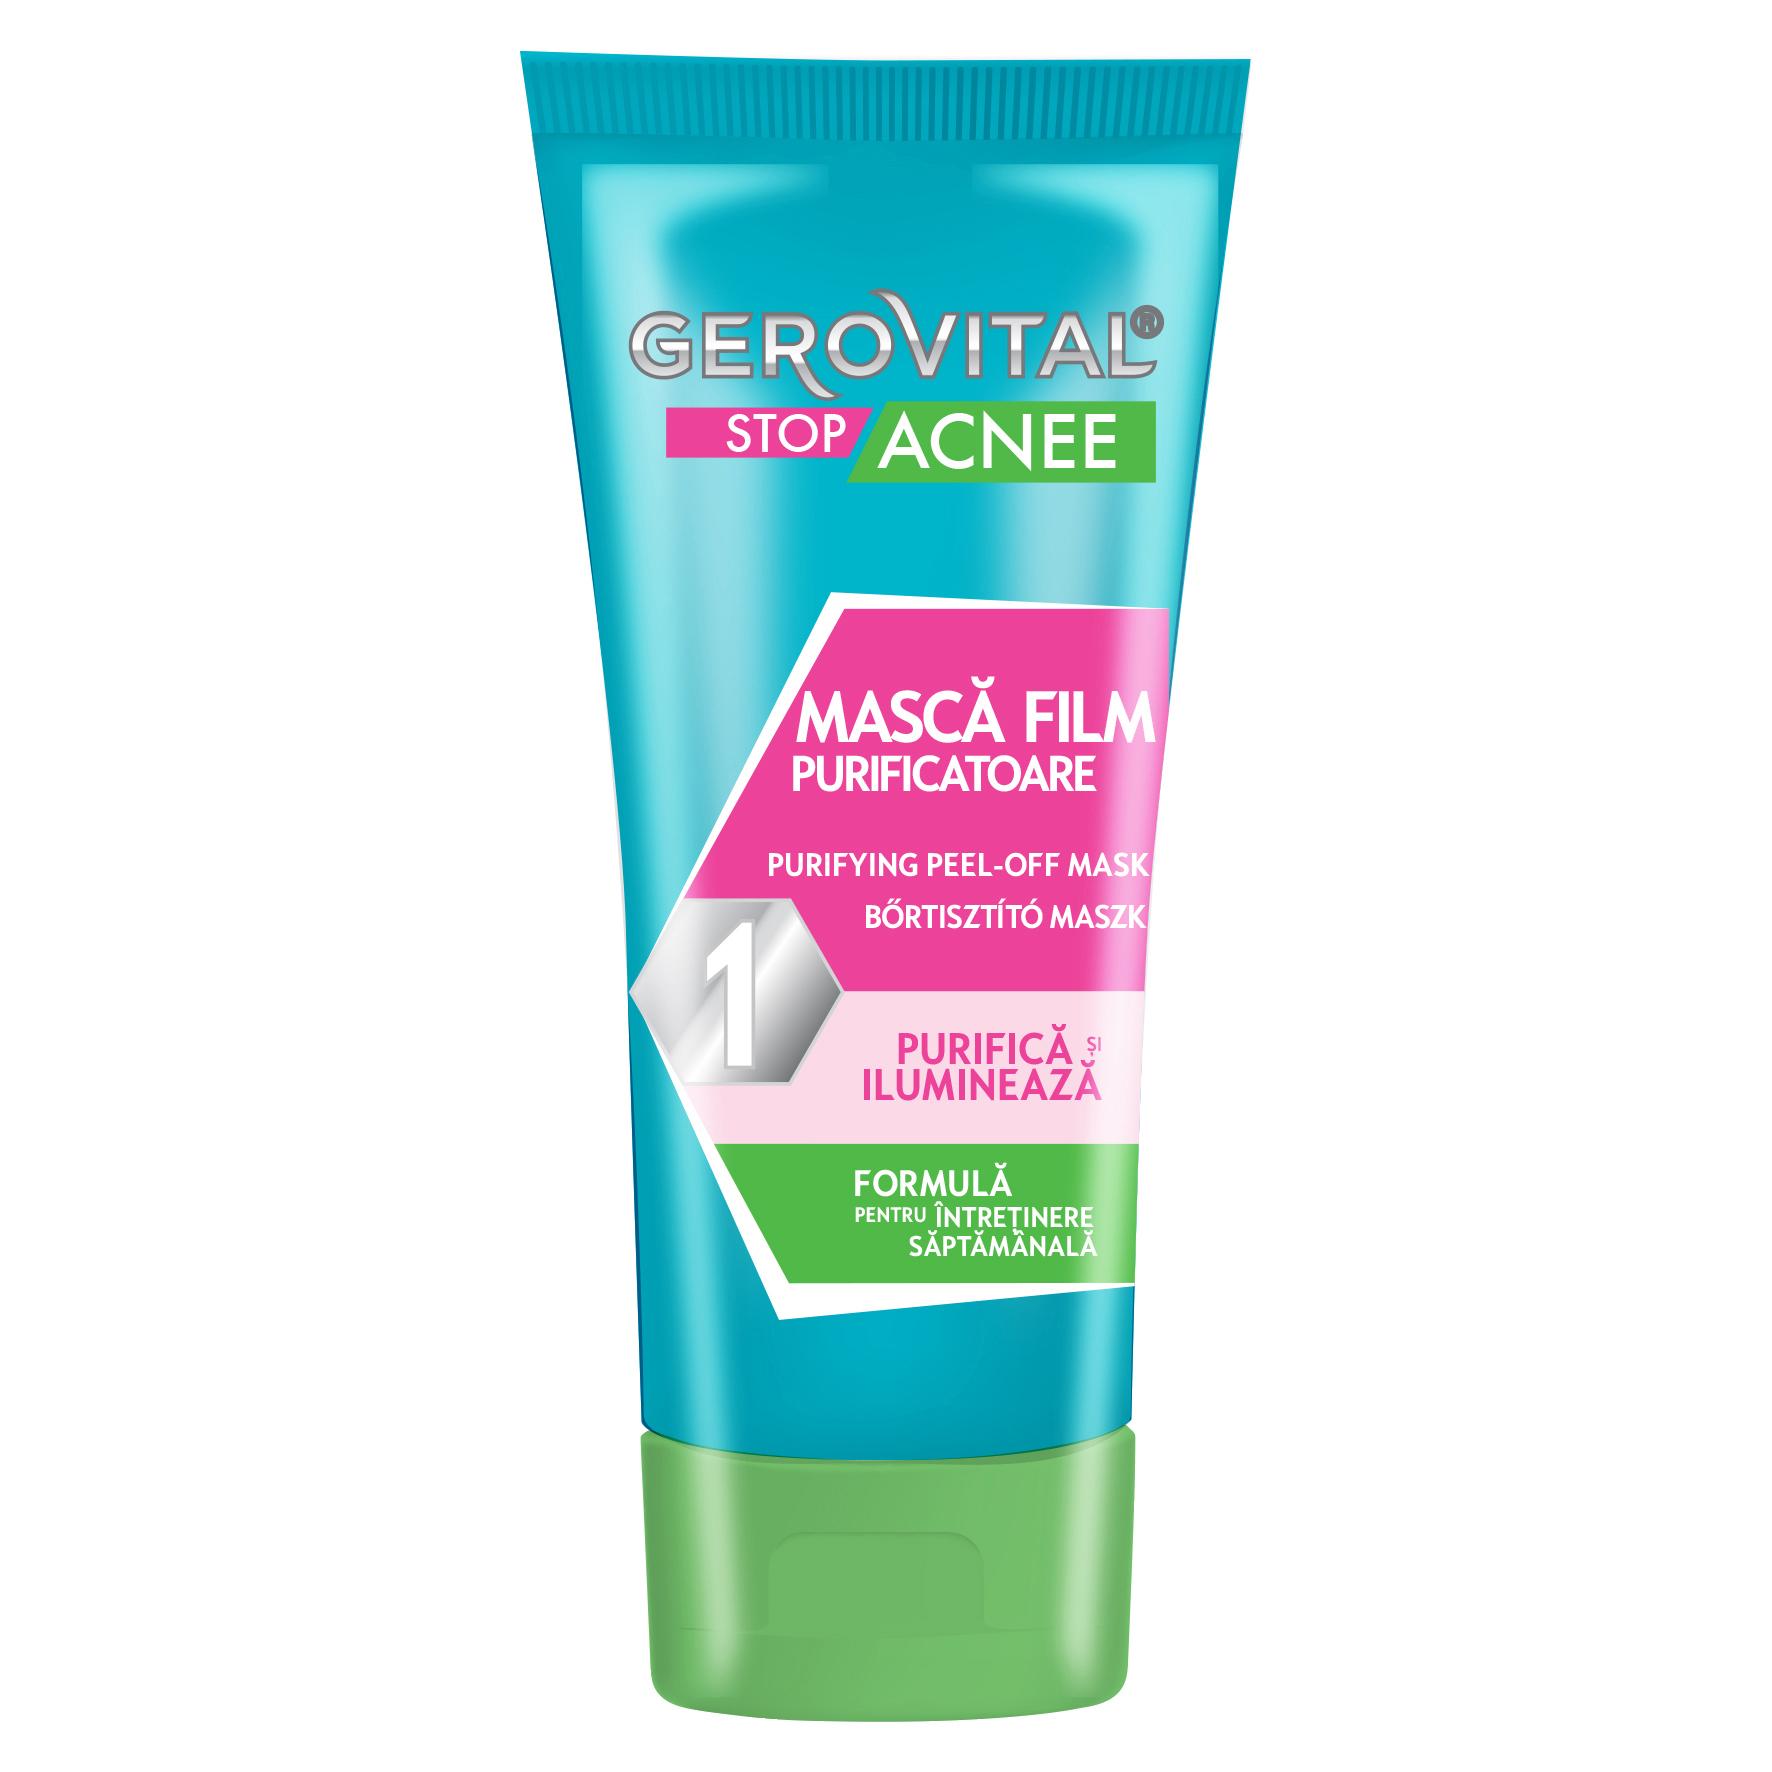 Masca purificatoare Stop Acnee Gerovital, 100 ml, Farmec